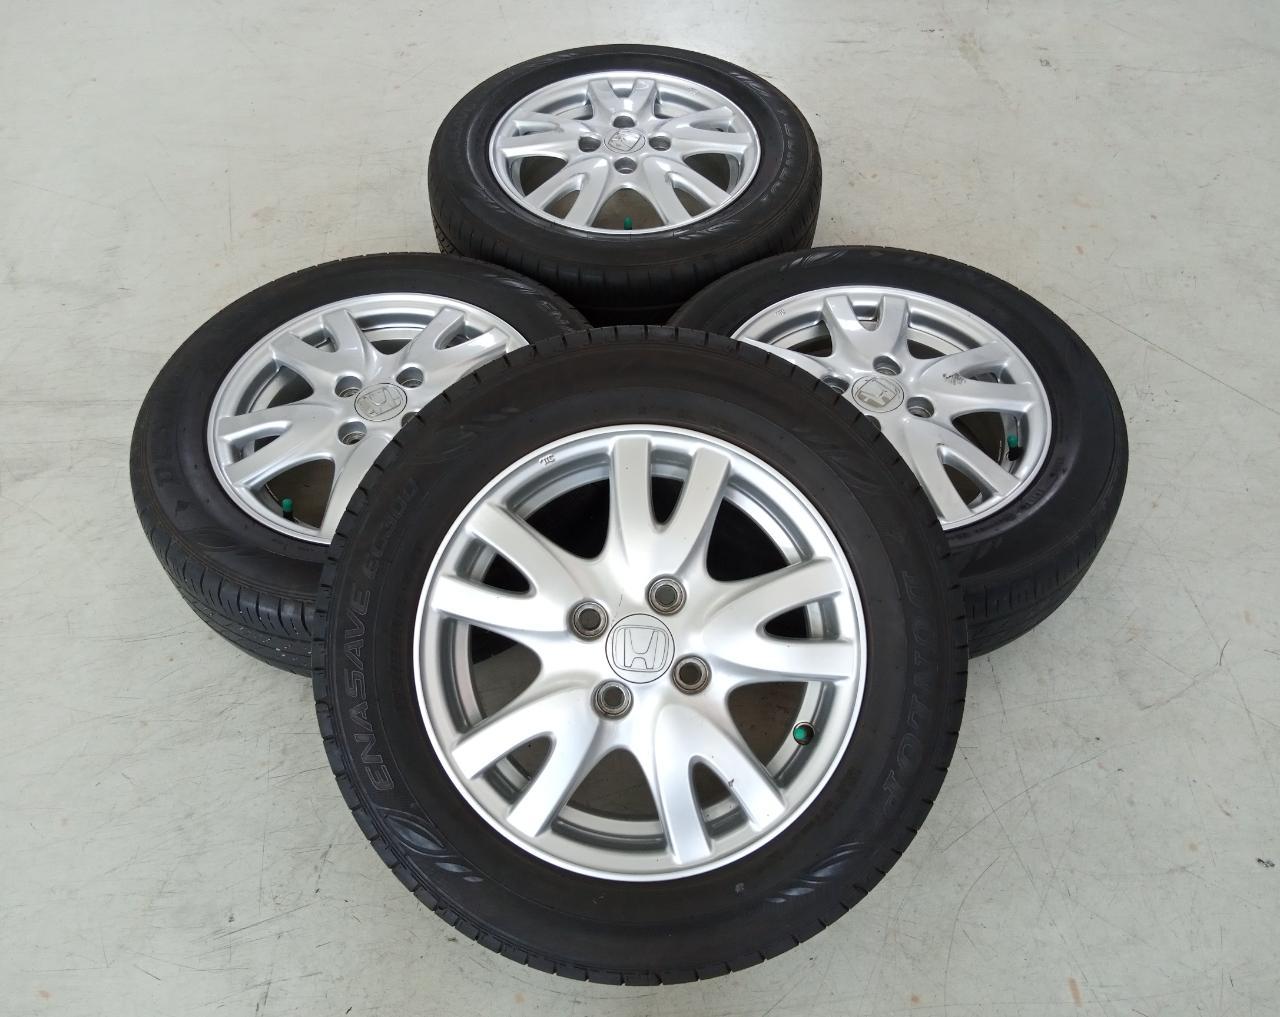 Velg Bekas Oem Honda Brio Ring 14 + Ban Dunlop 175/65/R14